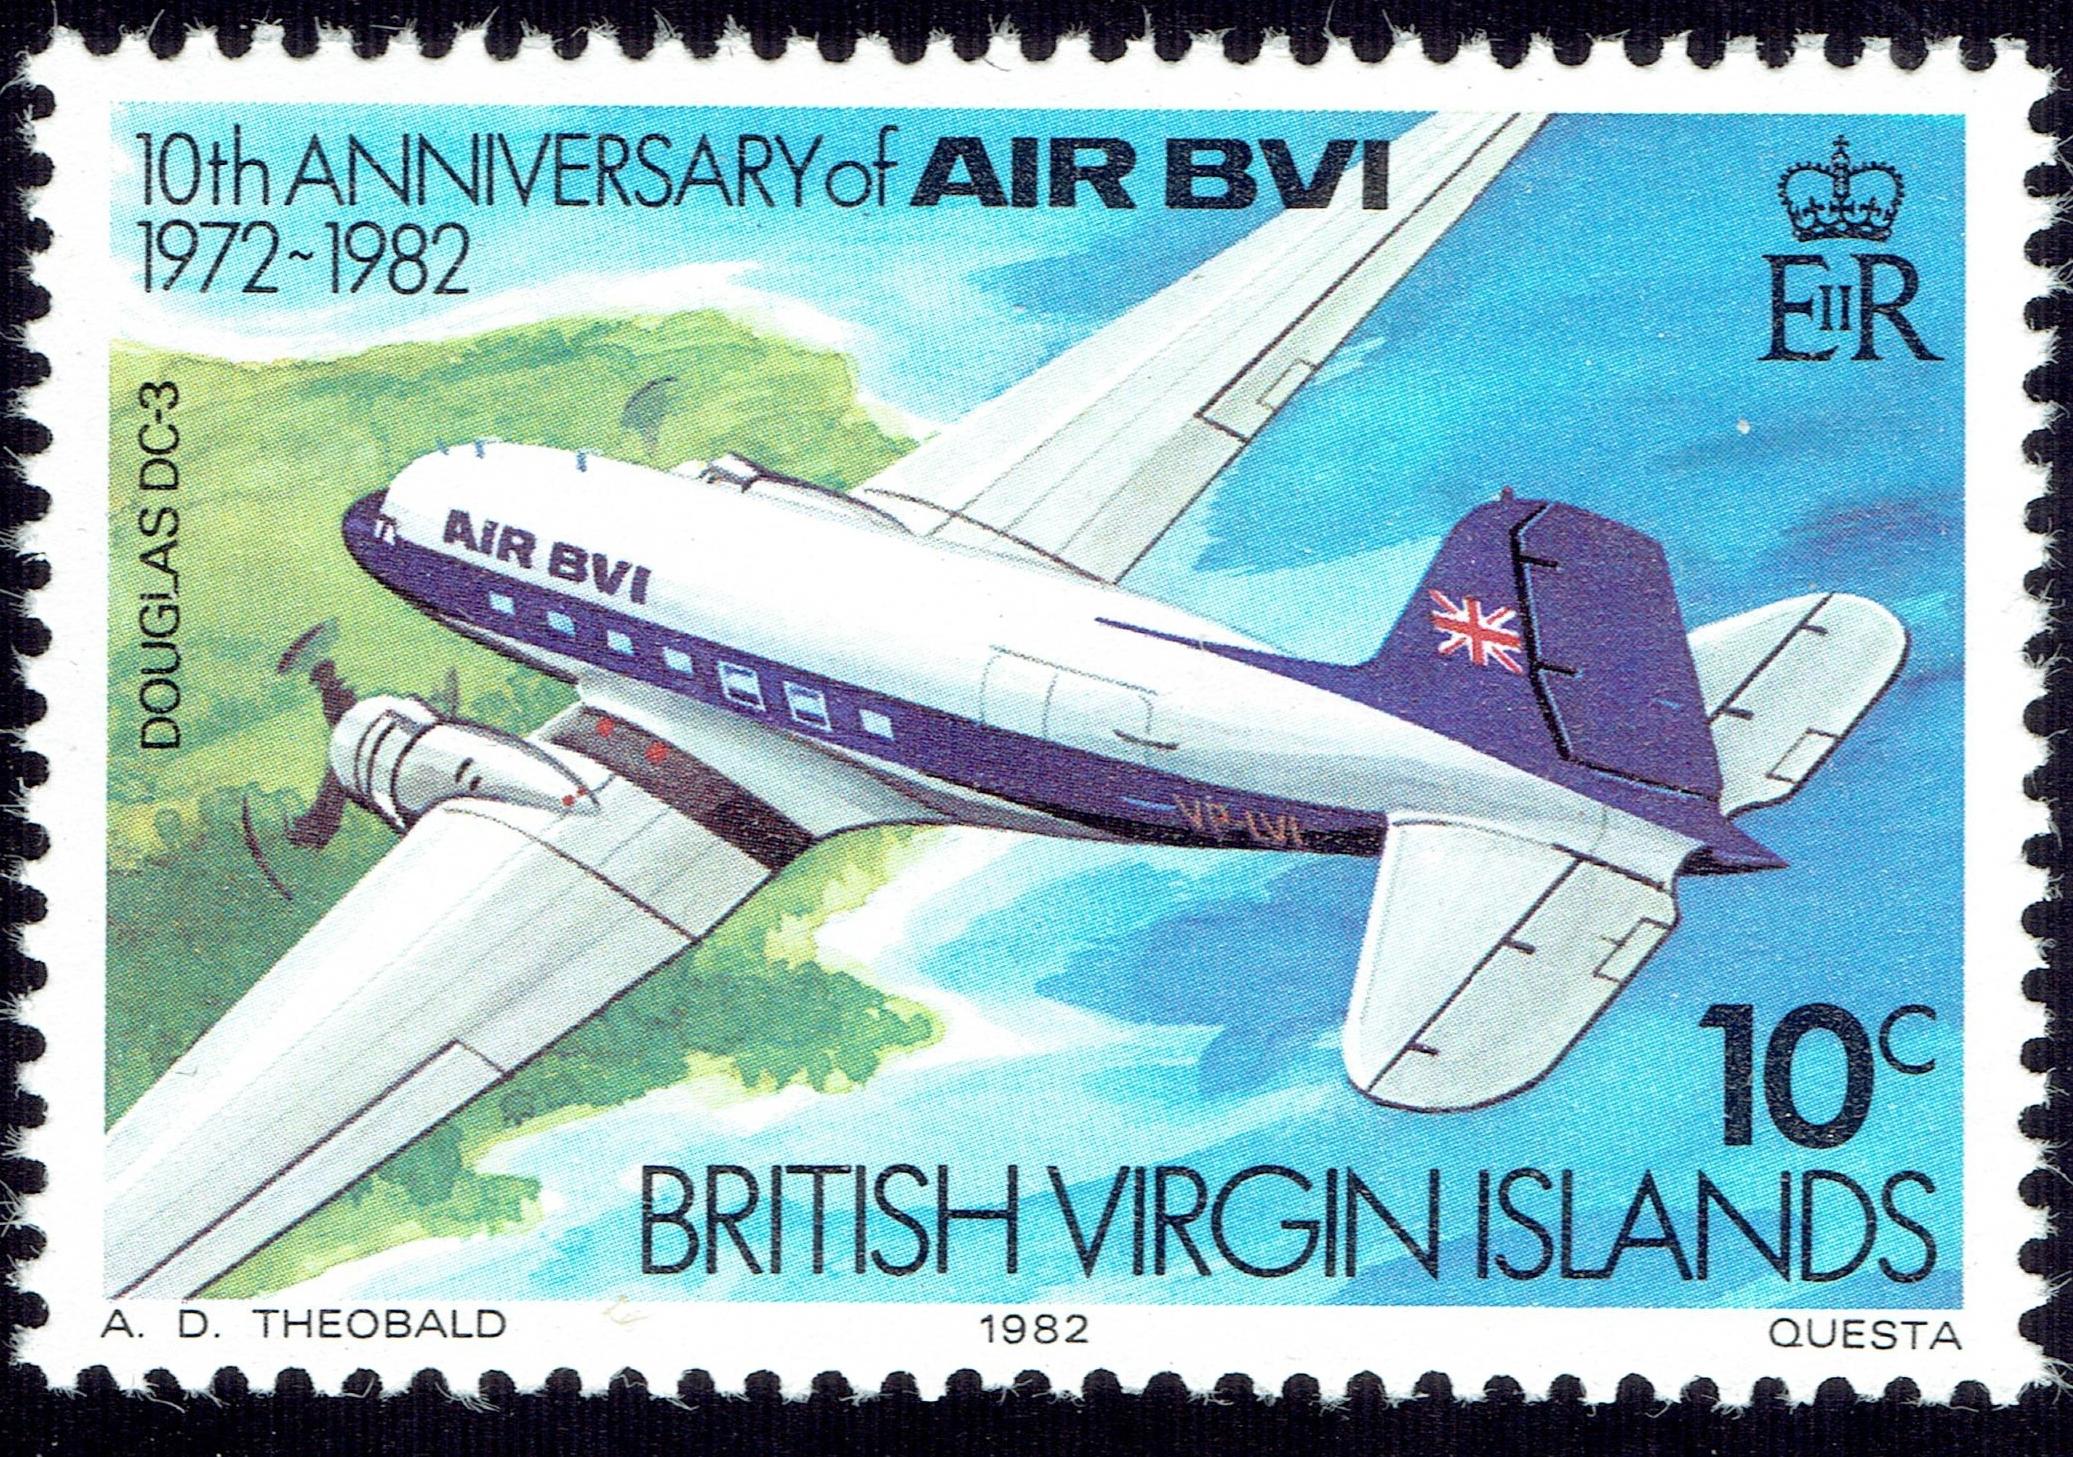 British Virgin Islands - Scott #434 (1982)